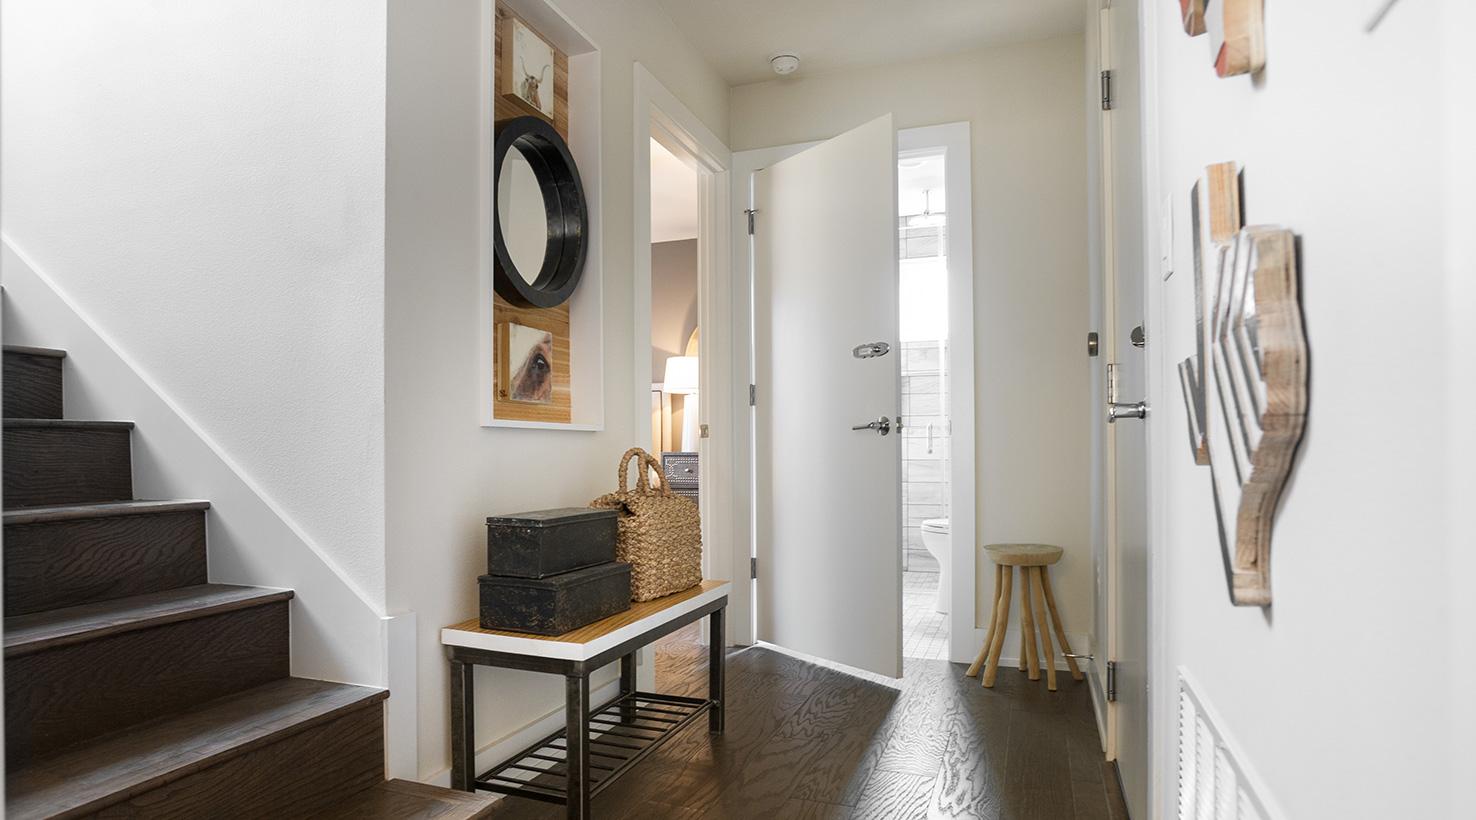 Image for Living Room Floor Plans